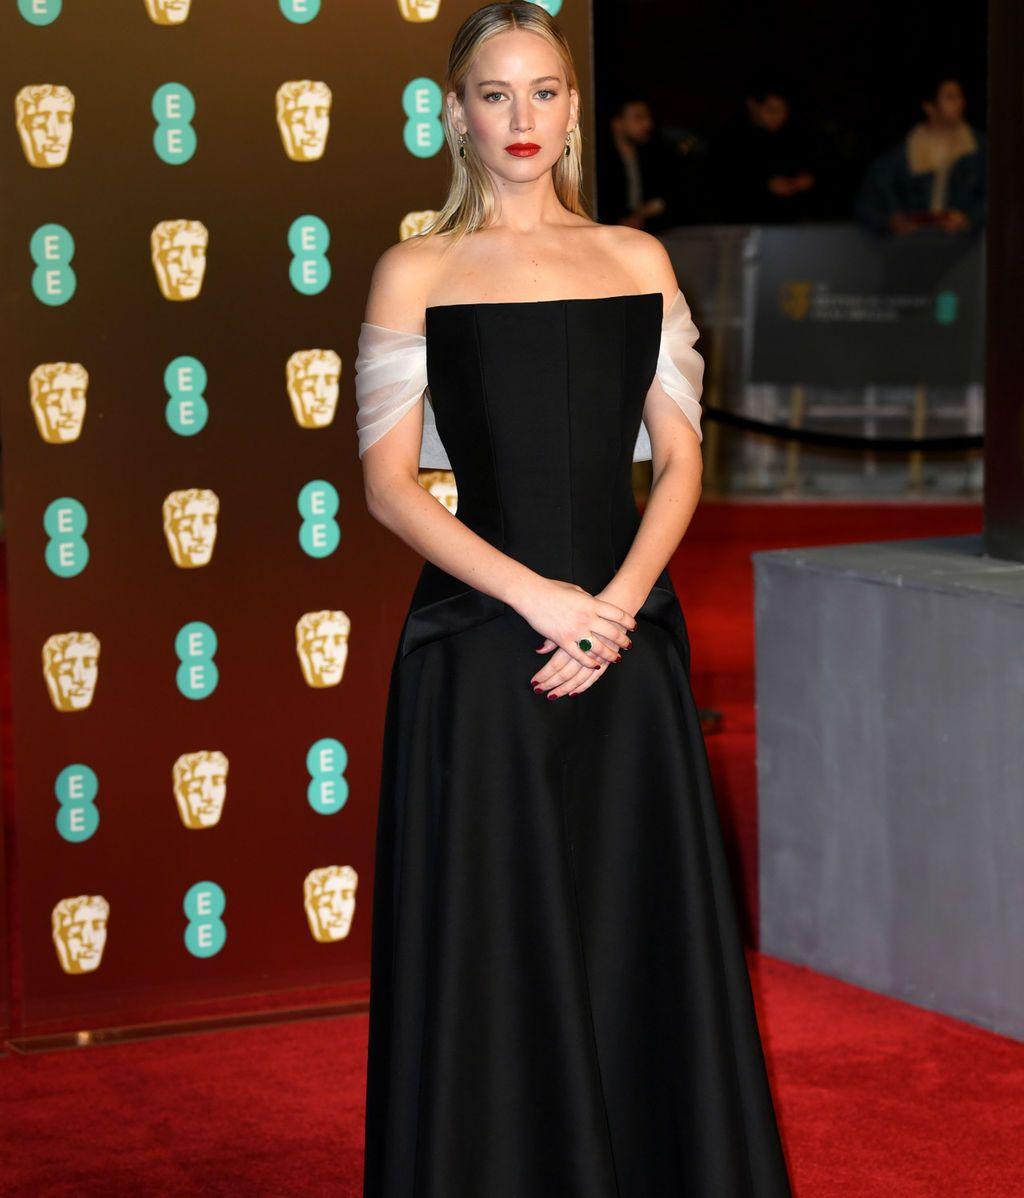 Jennifer Lawrence en la alfombra roja de los BAFTA